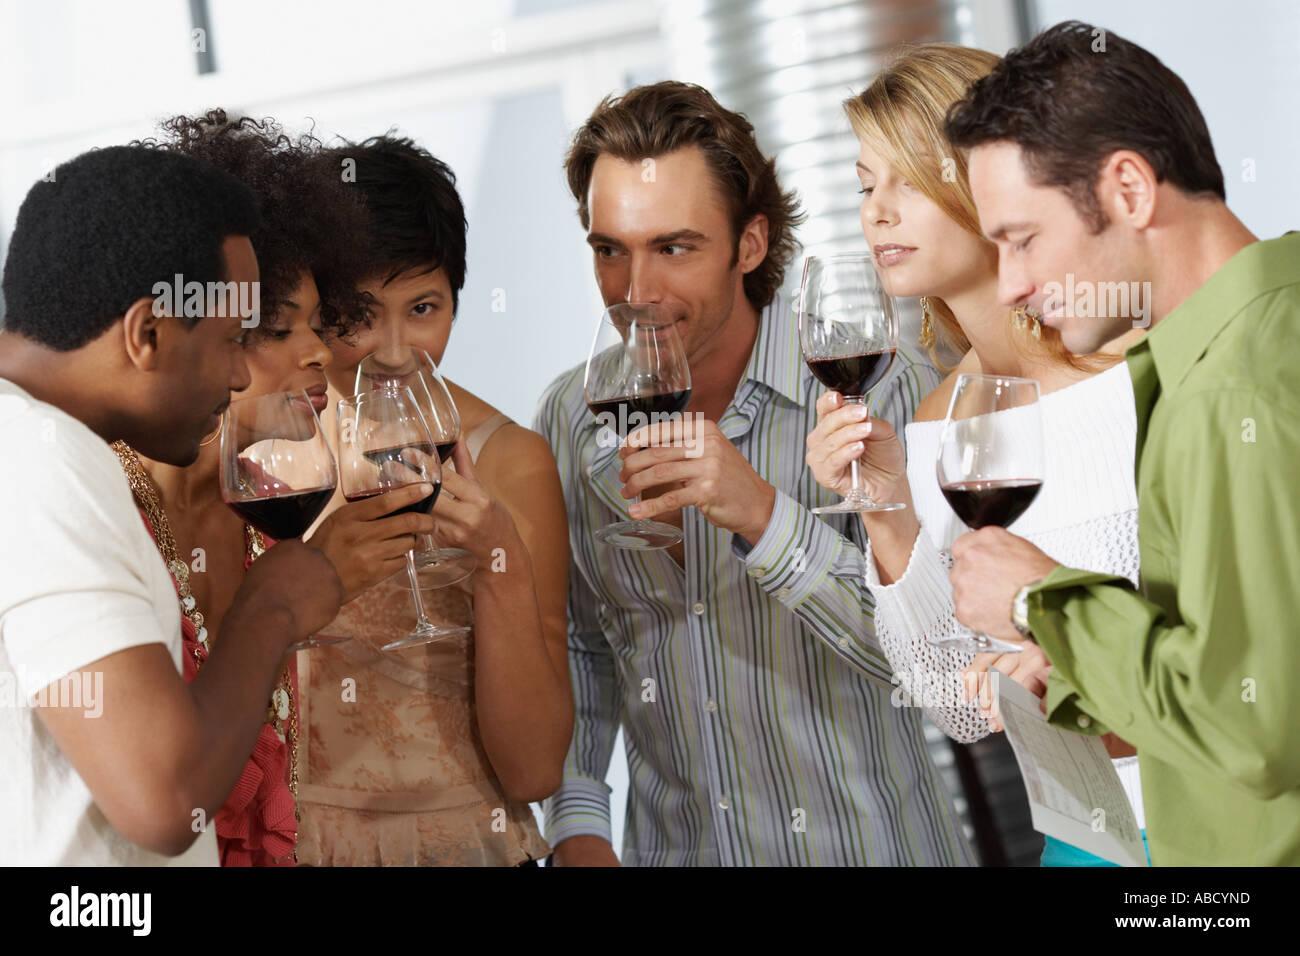 Friends appreciating wine - Stock Image